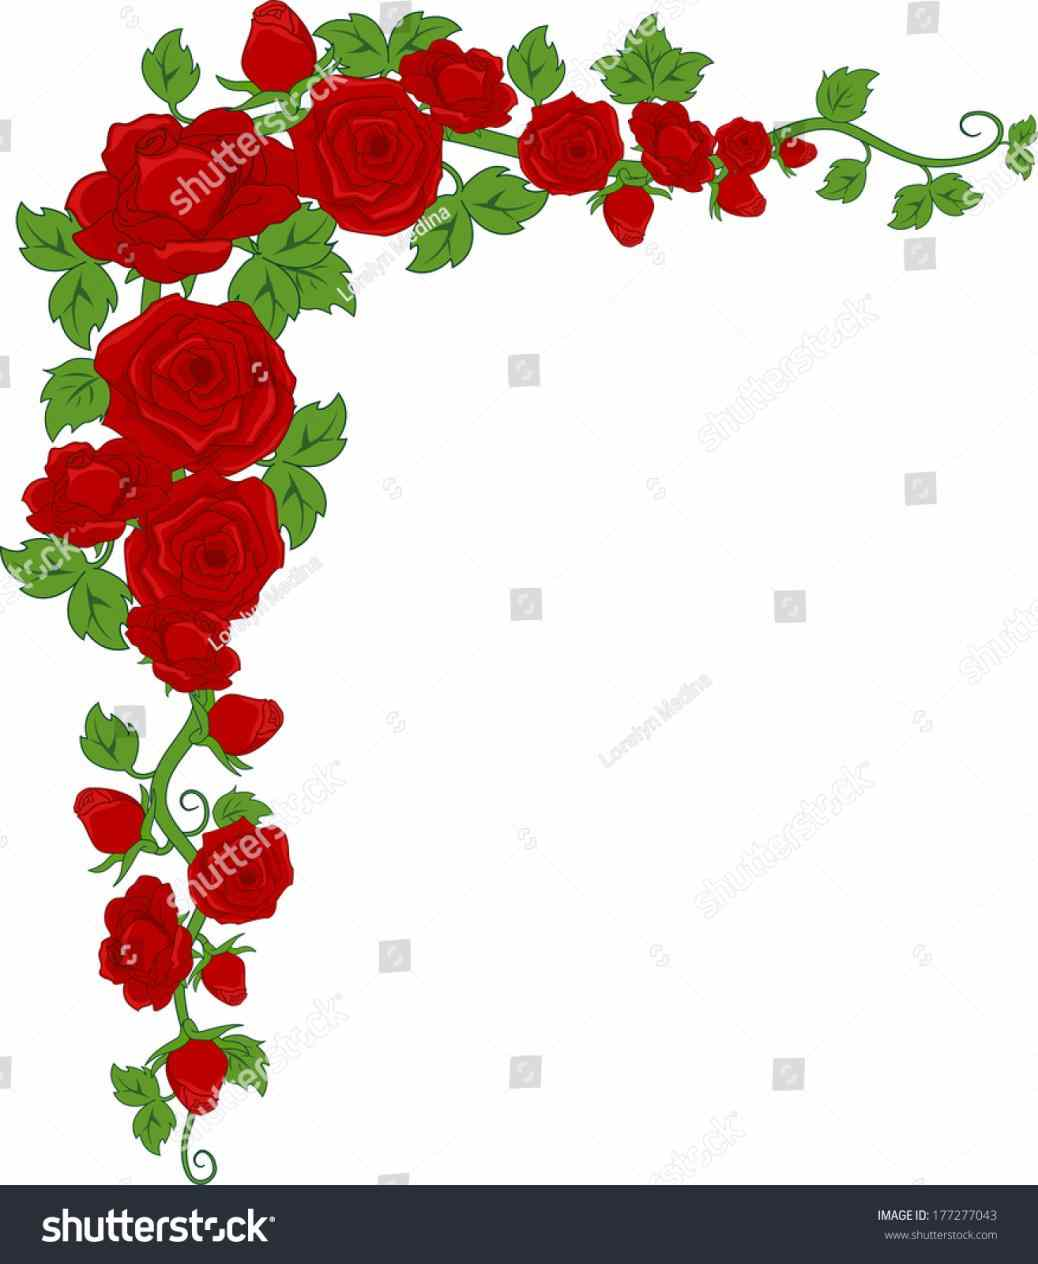 1038x1264 Png Flower Border Clip Art Clipart Png